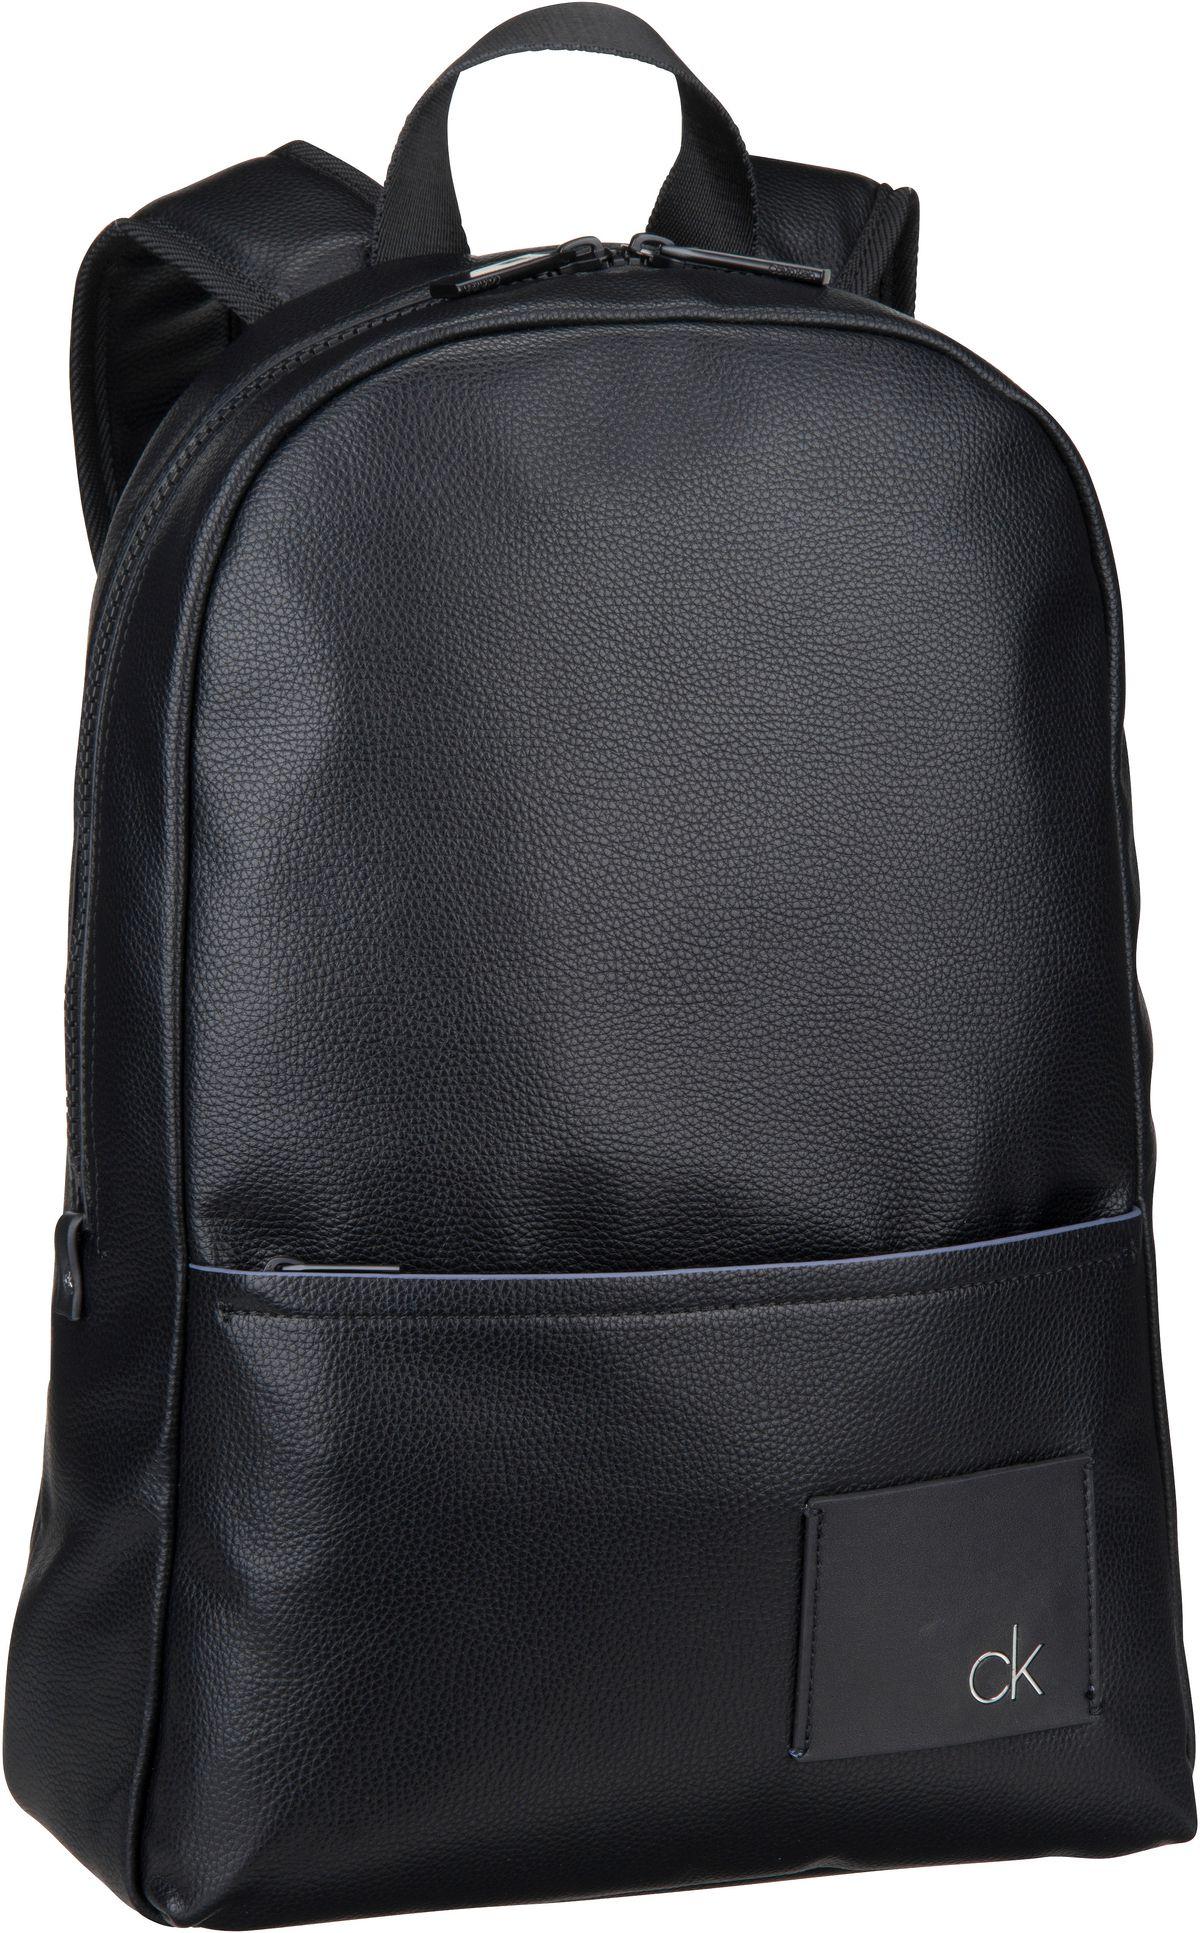 Rucksack / Daypack CK Direct Round Backpack Black